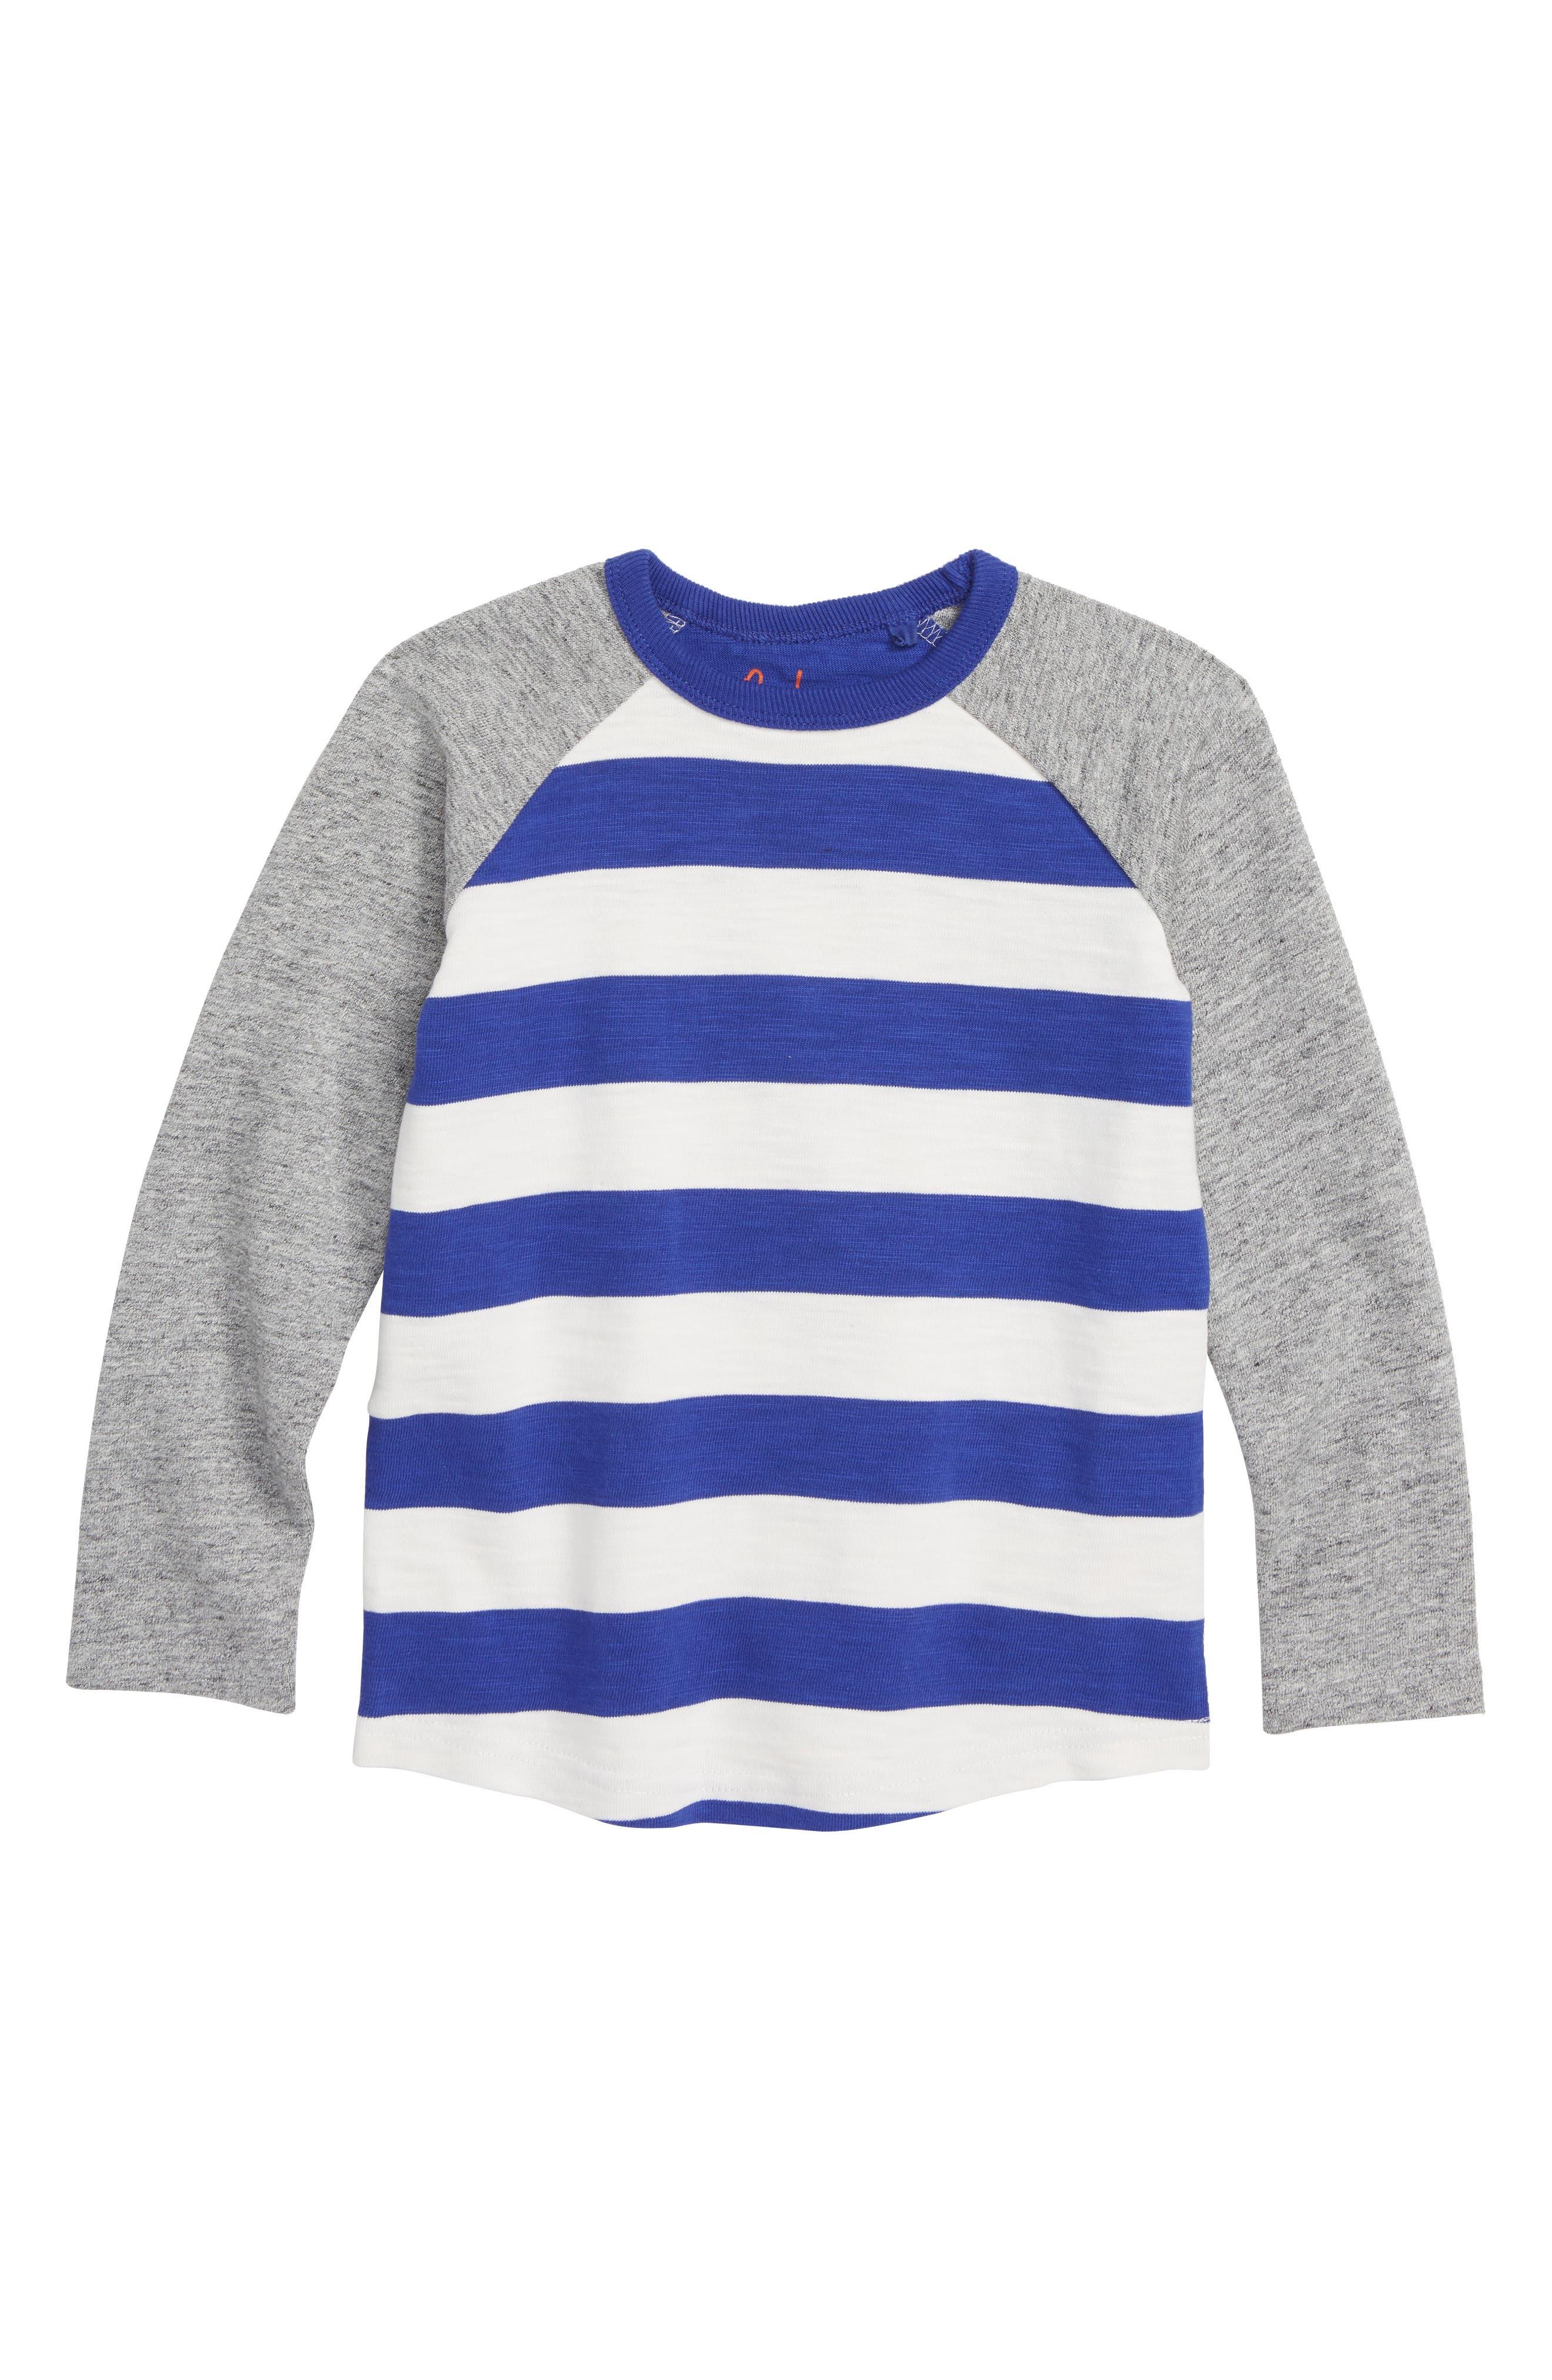 Stripe Raglan T-Shirt,                         Main,                         color, RICHIE BLUE/ ECRU